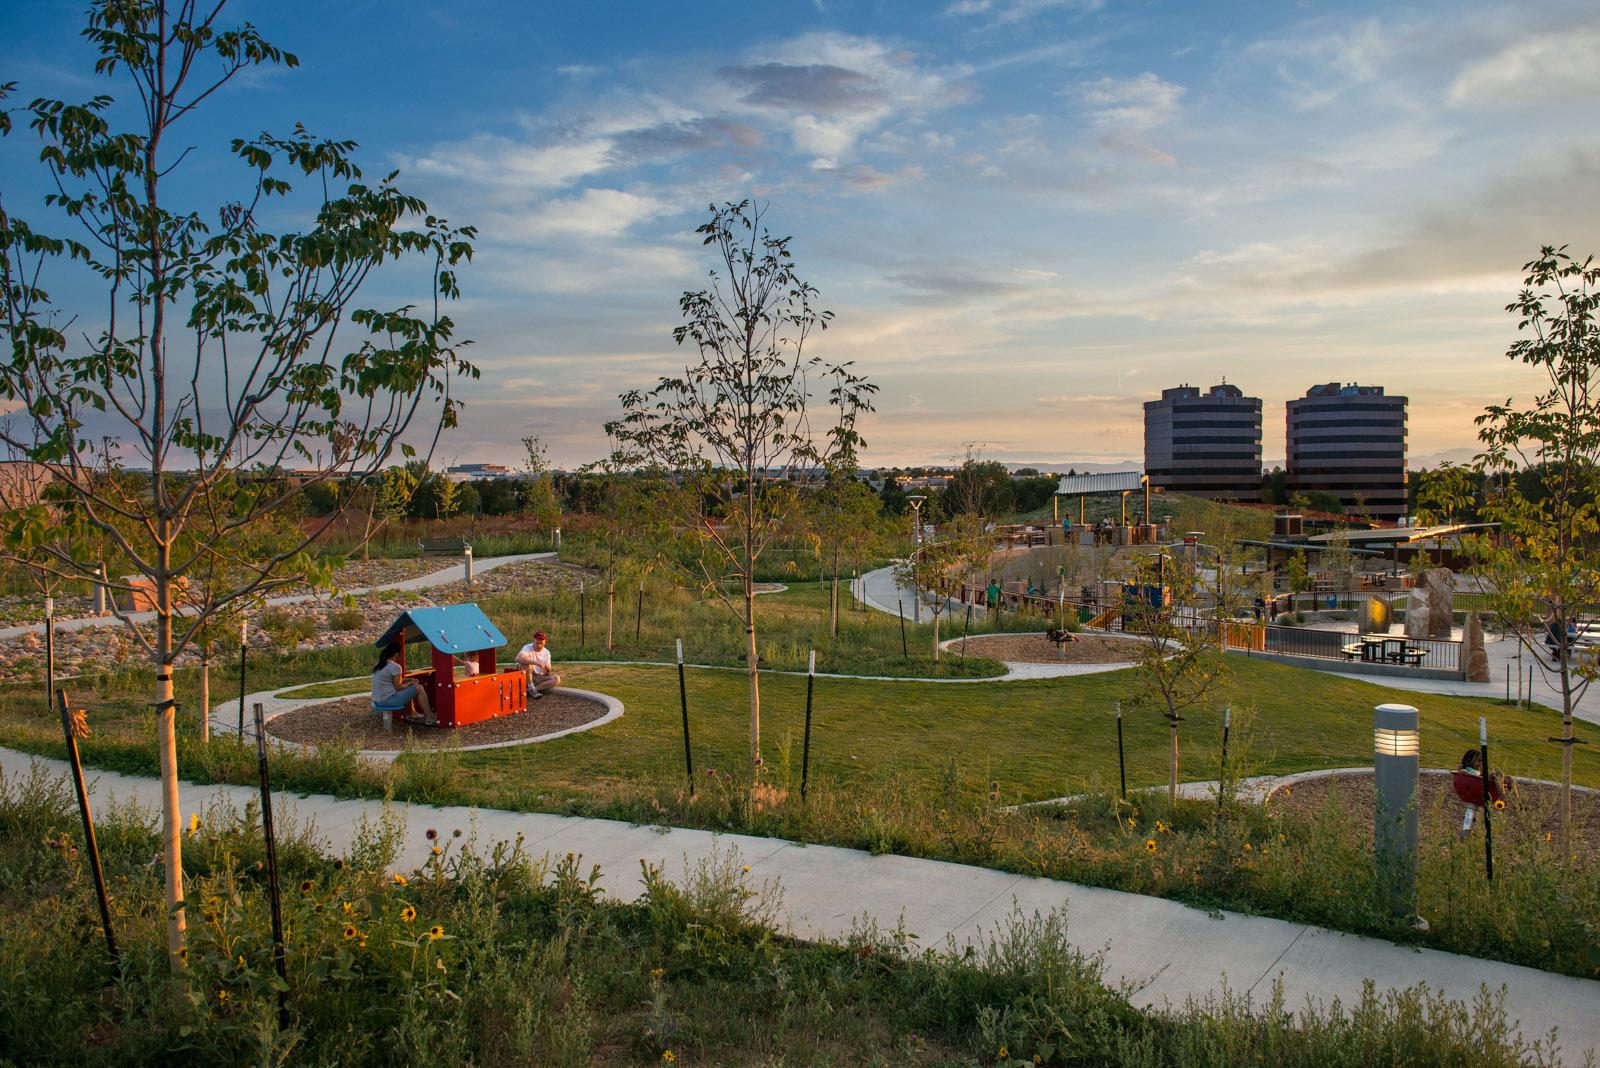 Park overview